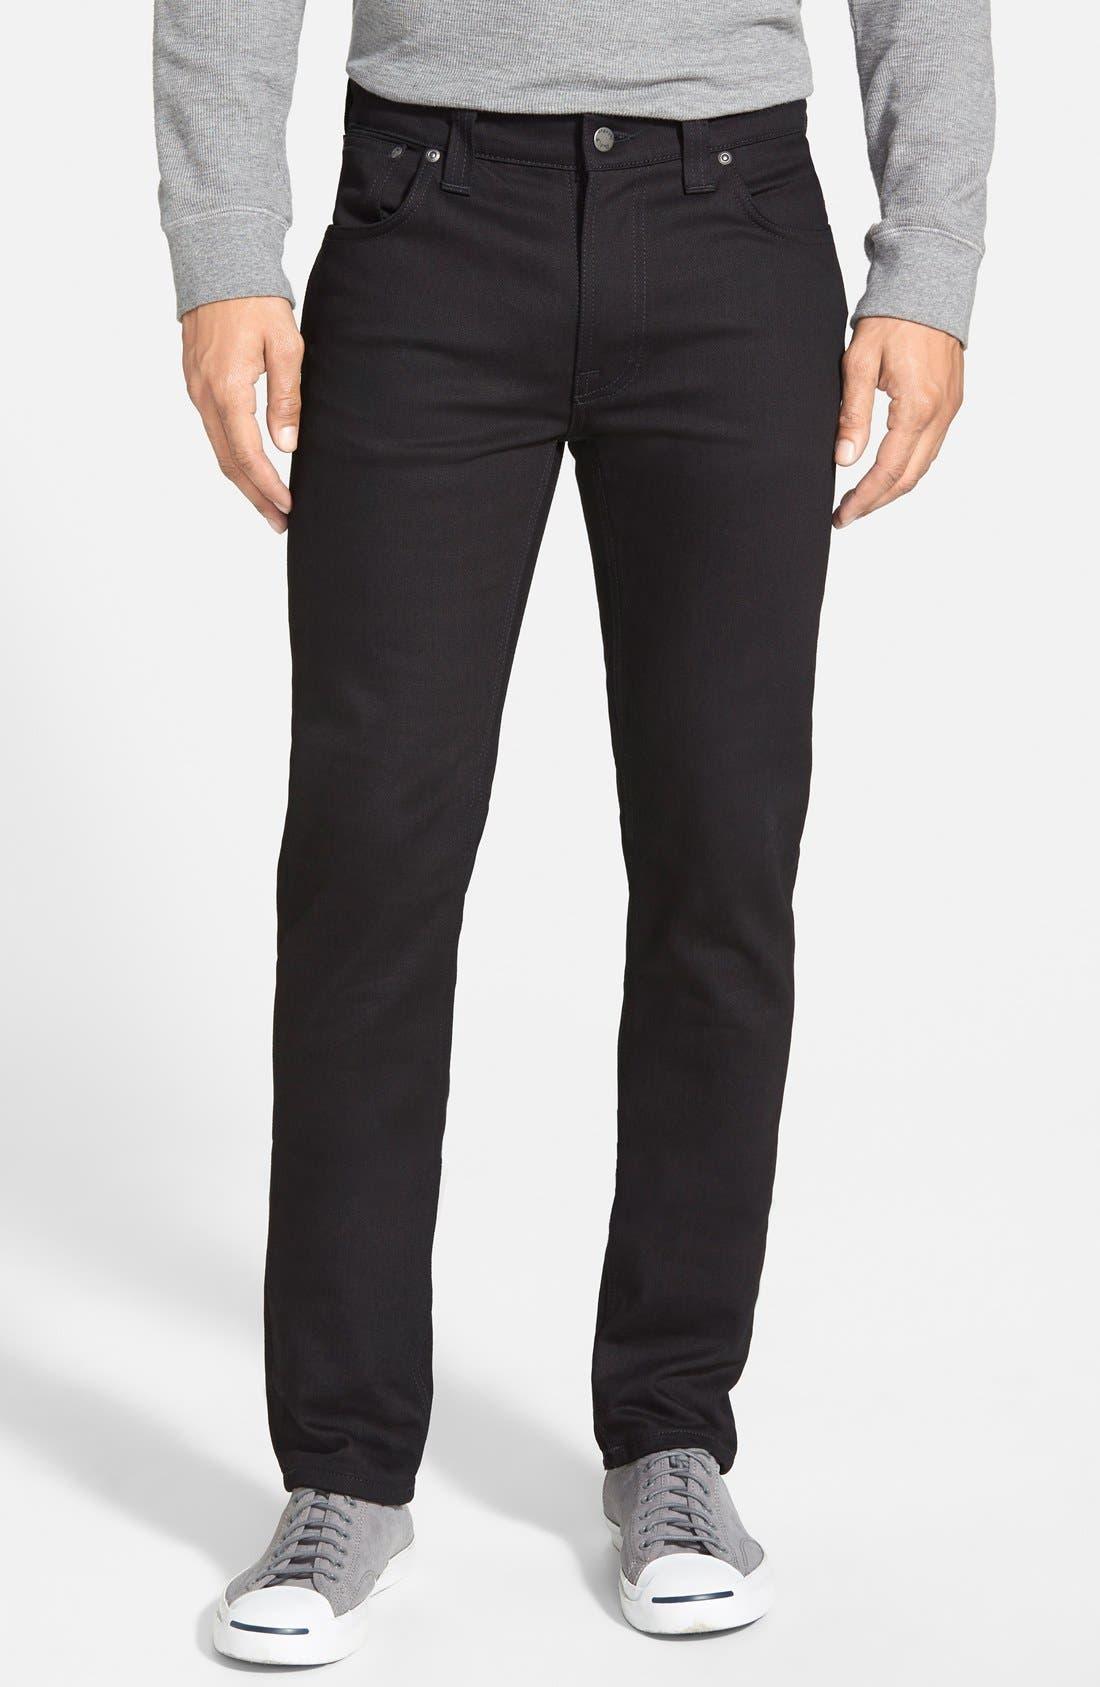 Alternate Image 1 Selected - Nudie Jeans 'Thin Finn' Skinny Fit Jeans (Black Ring)